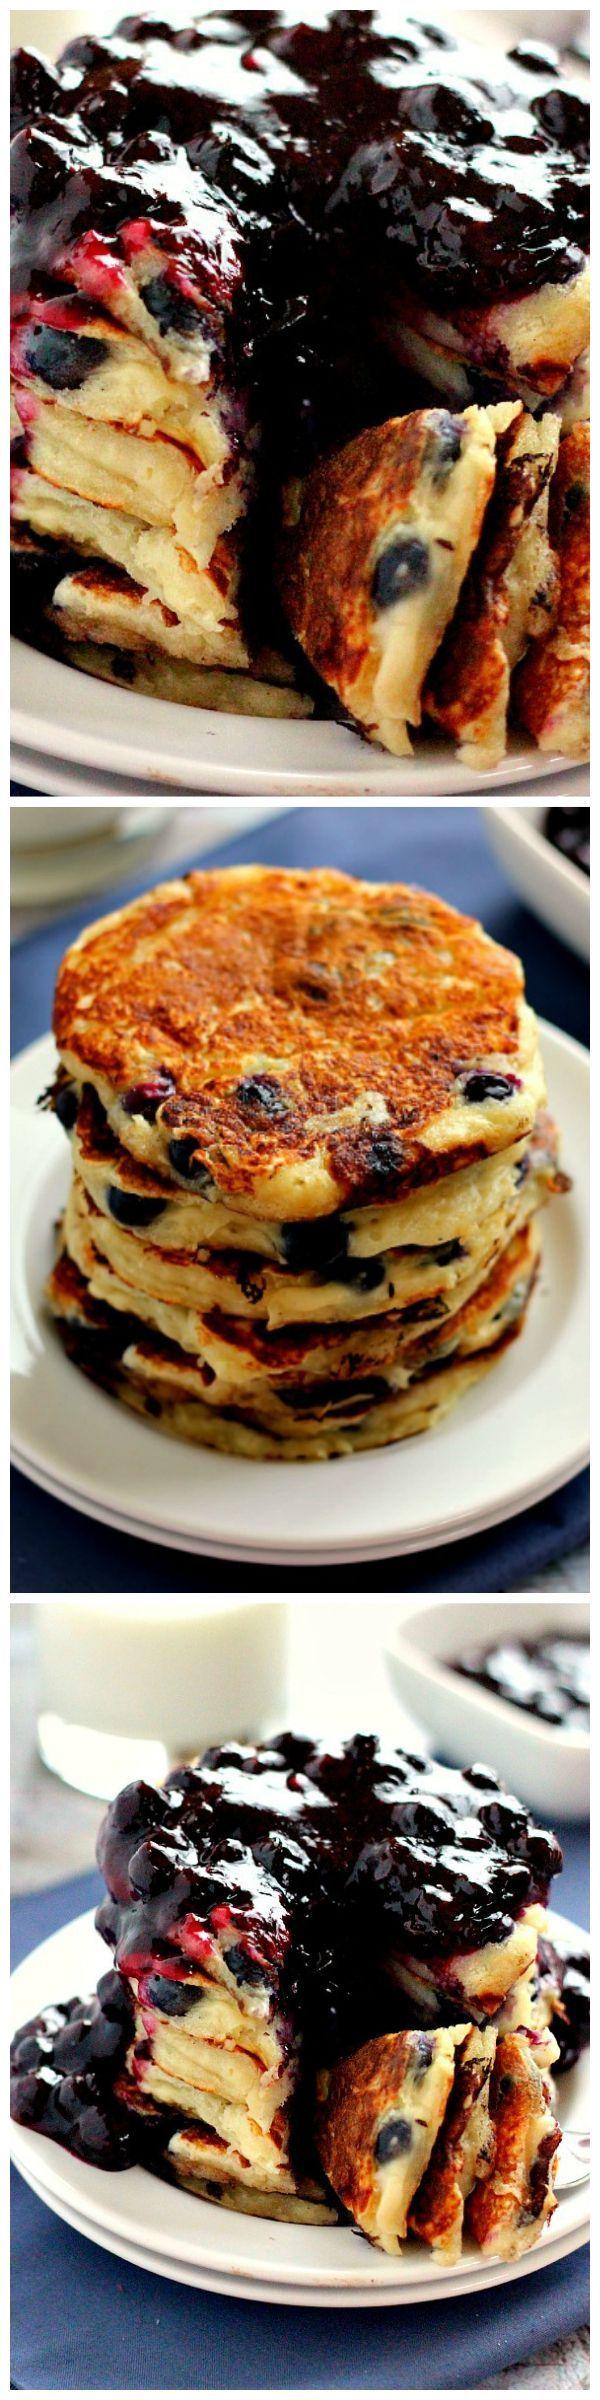 Budget dish - custard pancakes on yogurt